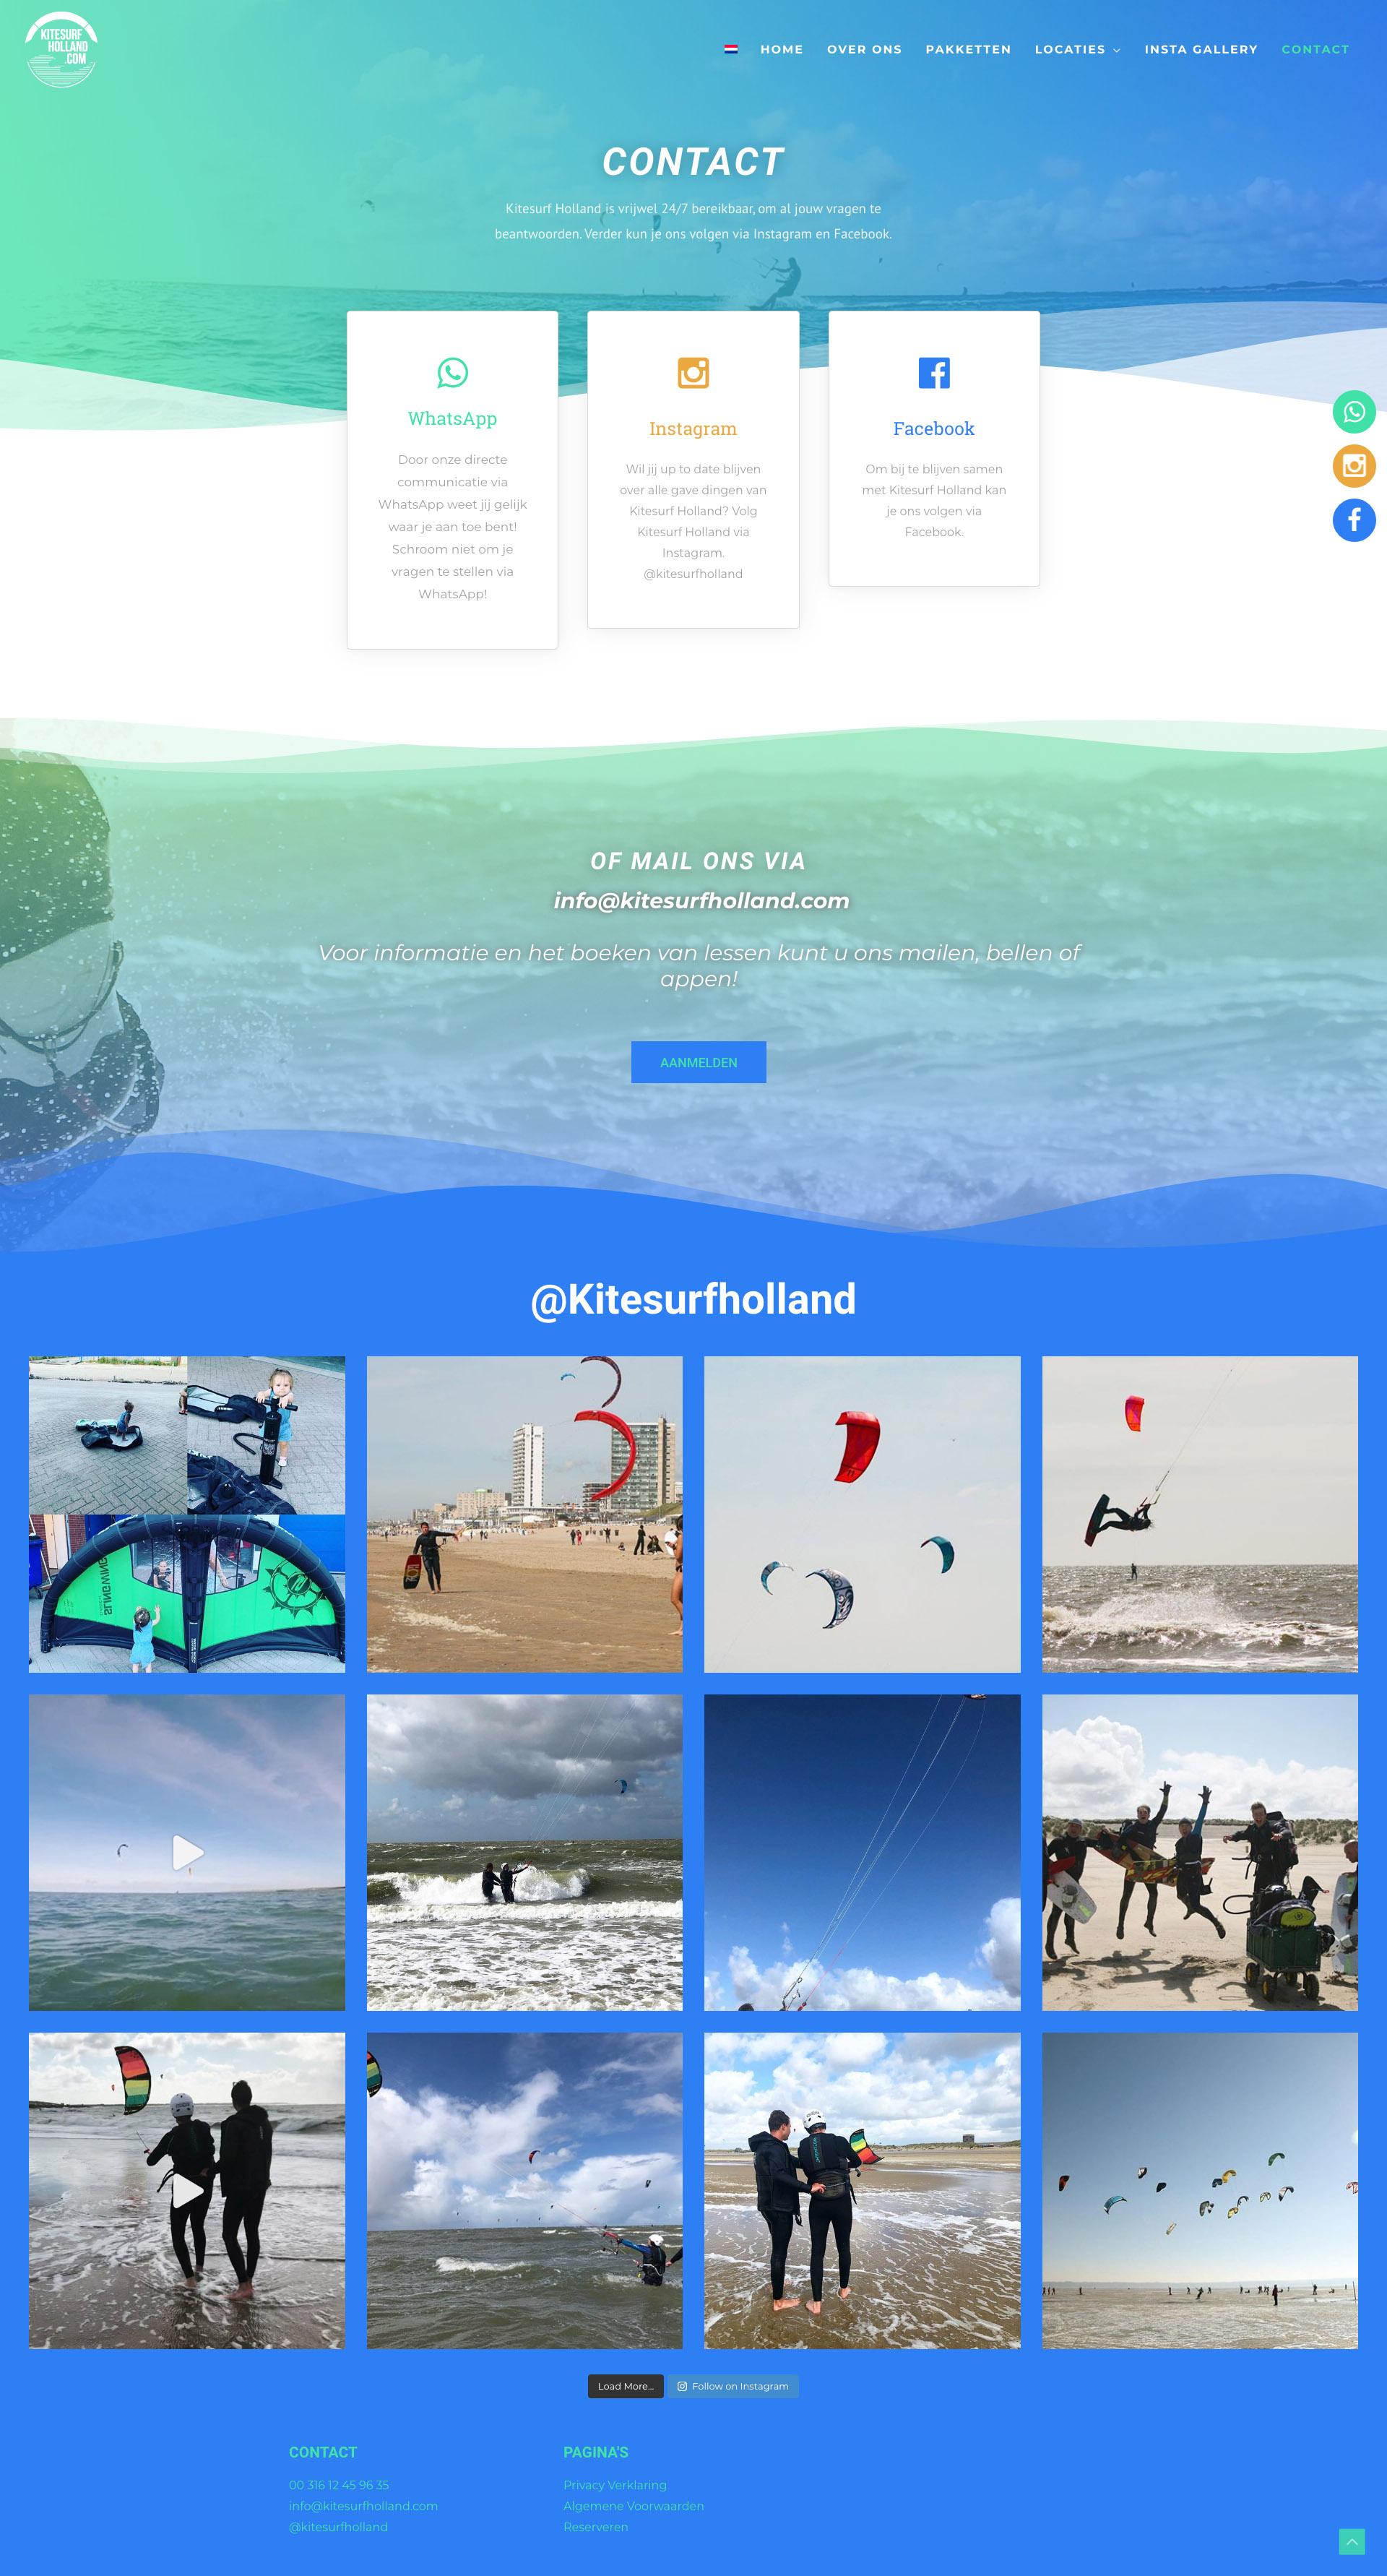 Kitesurfholland - Contact